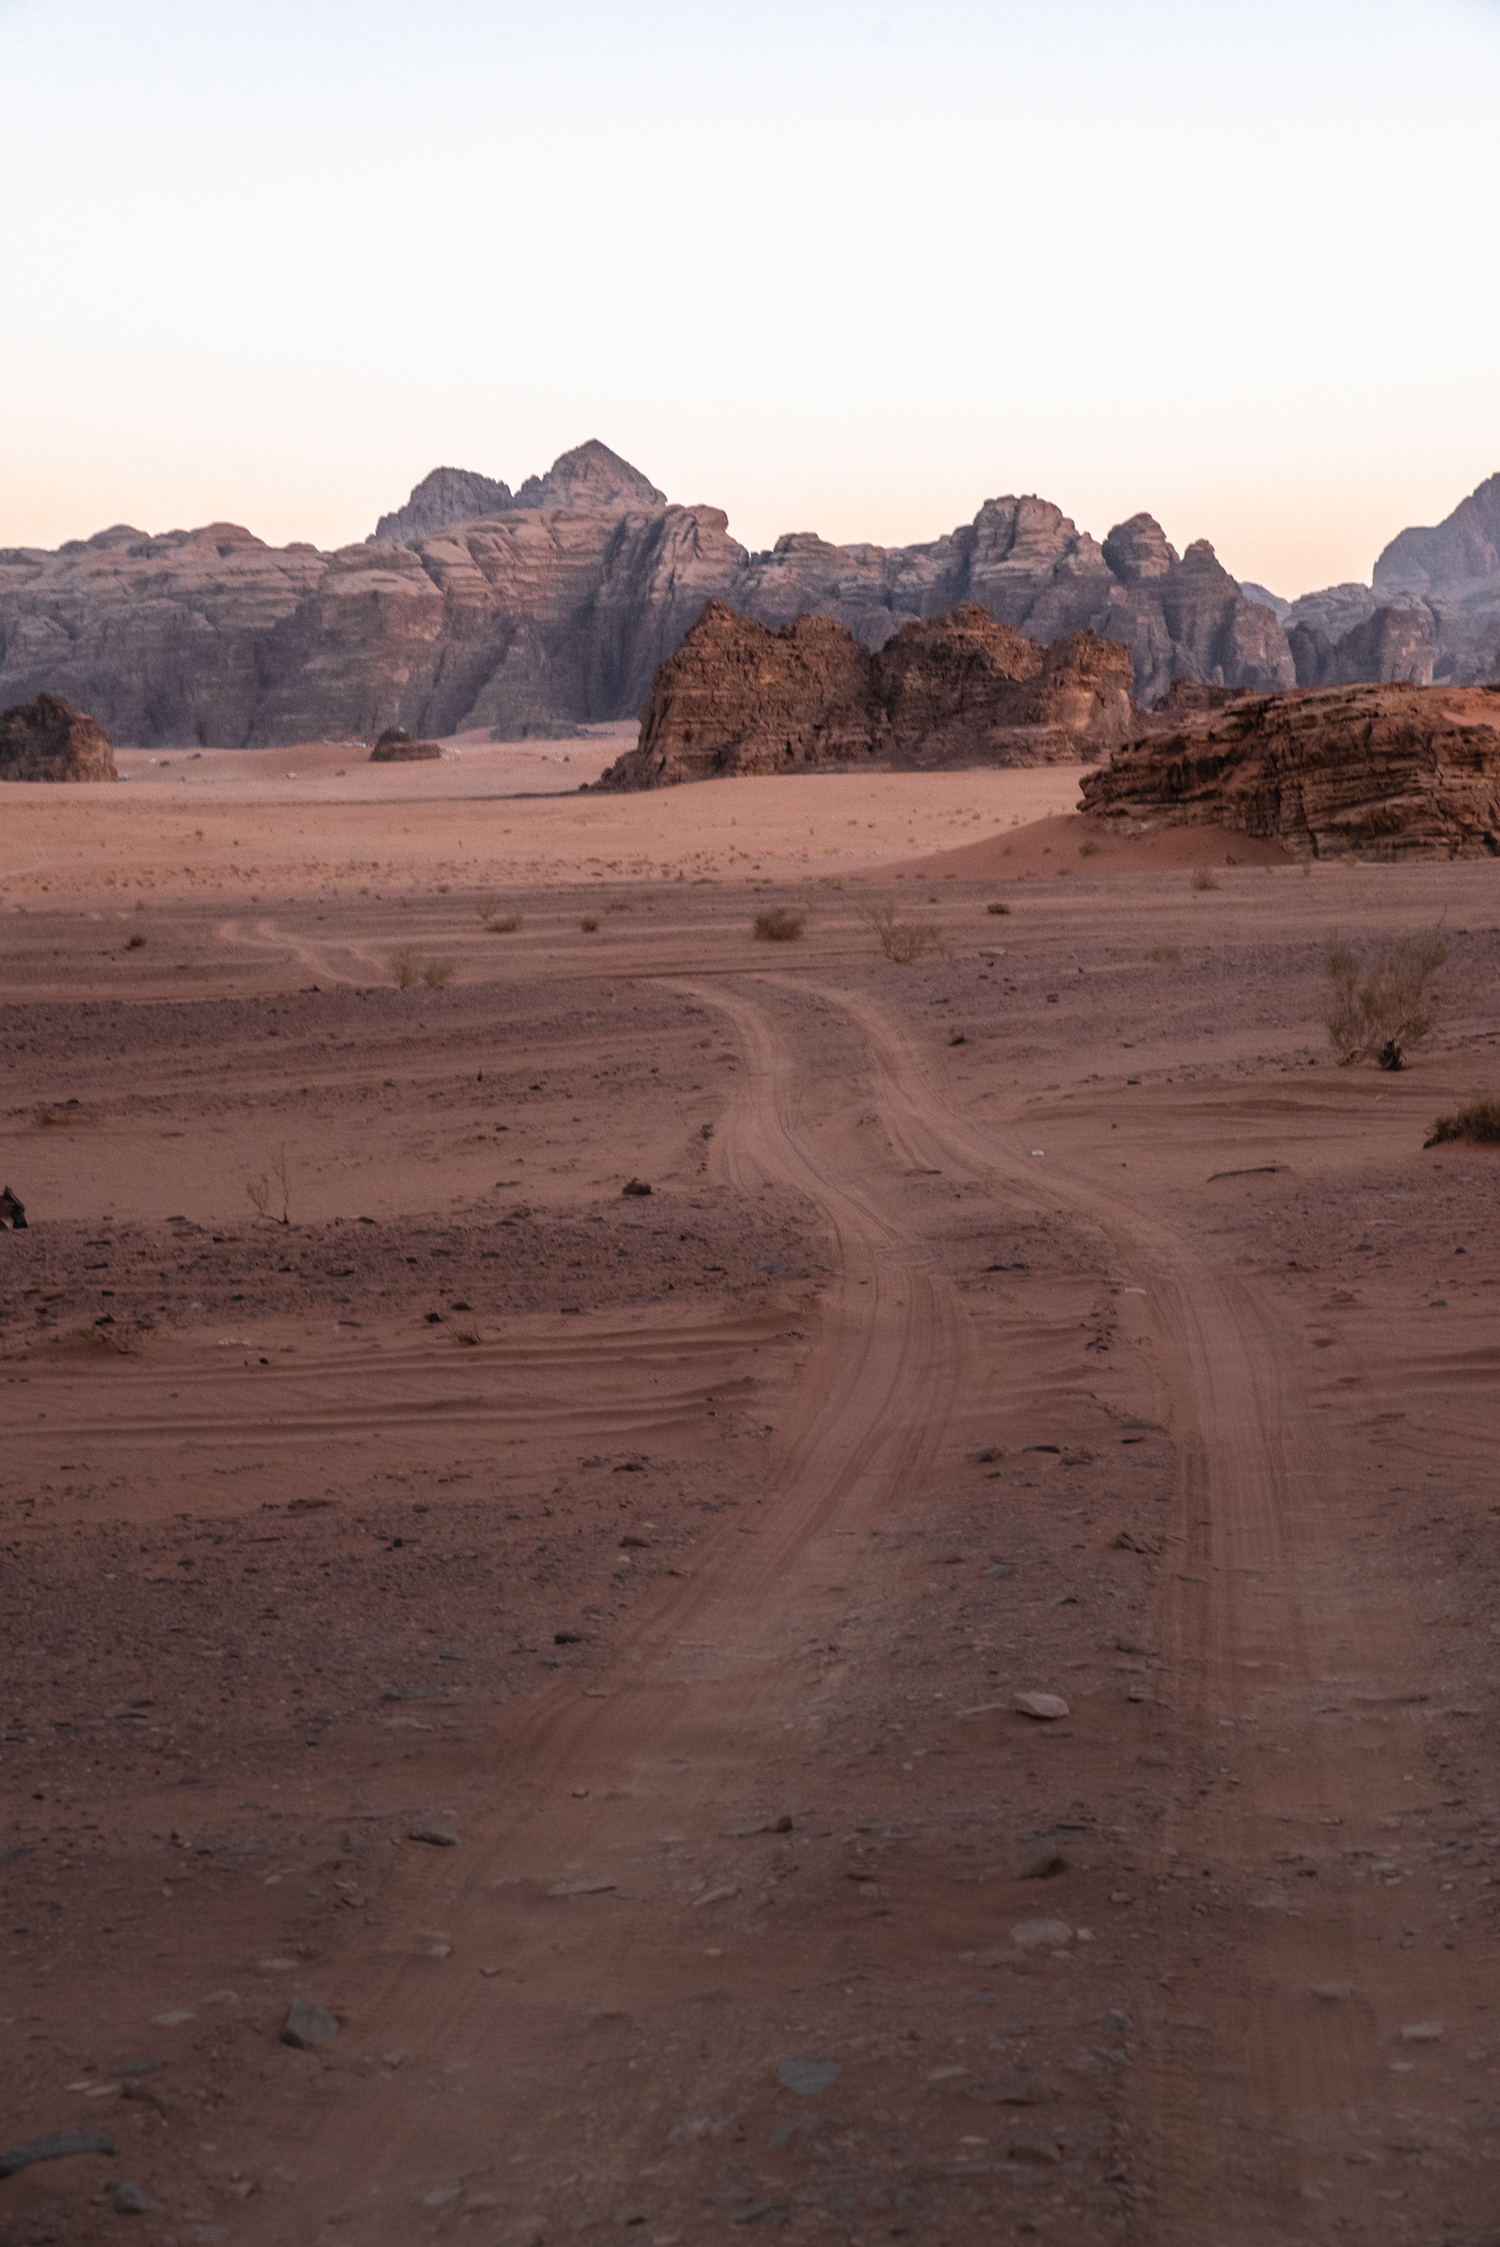 Desire lines at dusk in Jordan's Wadi Rum desert - by Ben Holbrook from DriftwoodJournals.com.